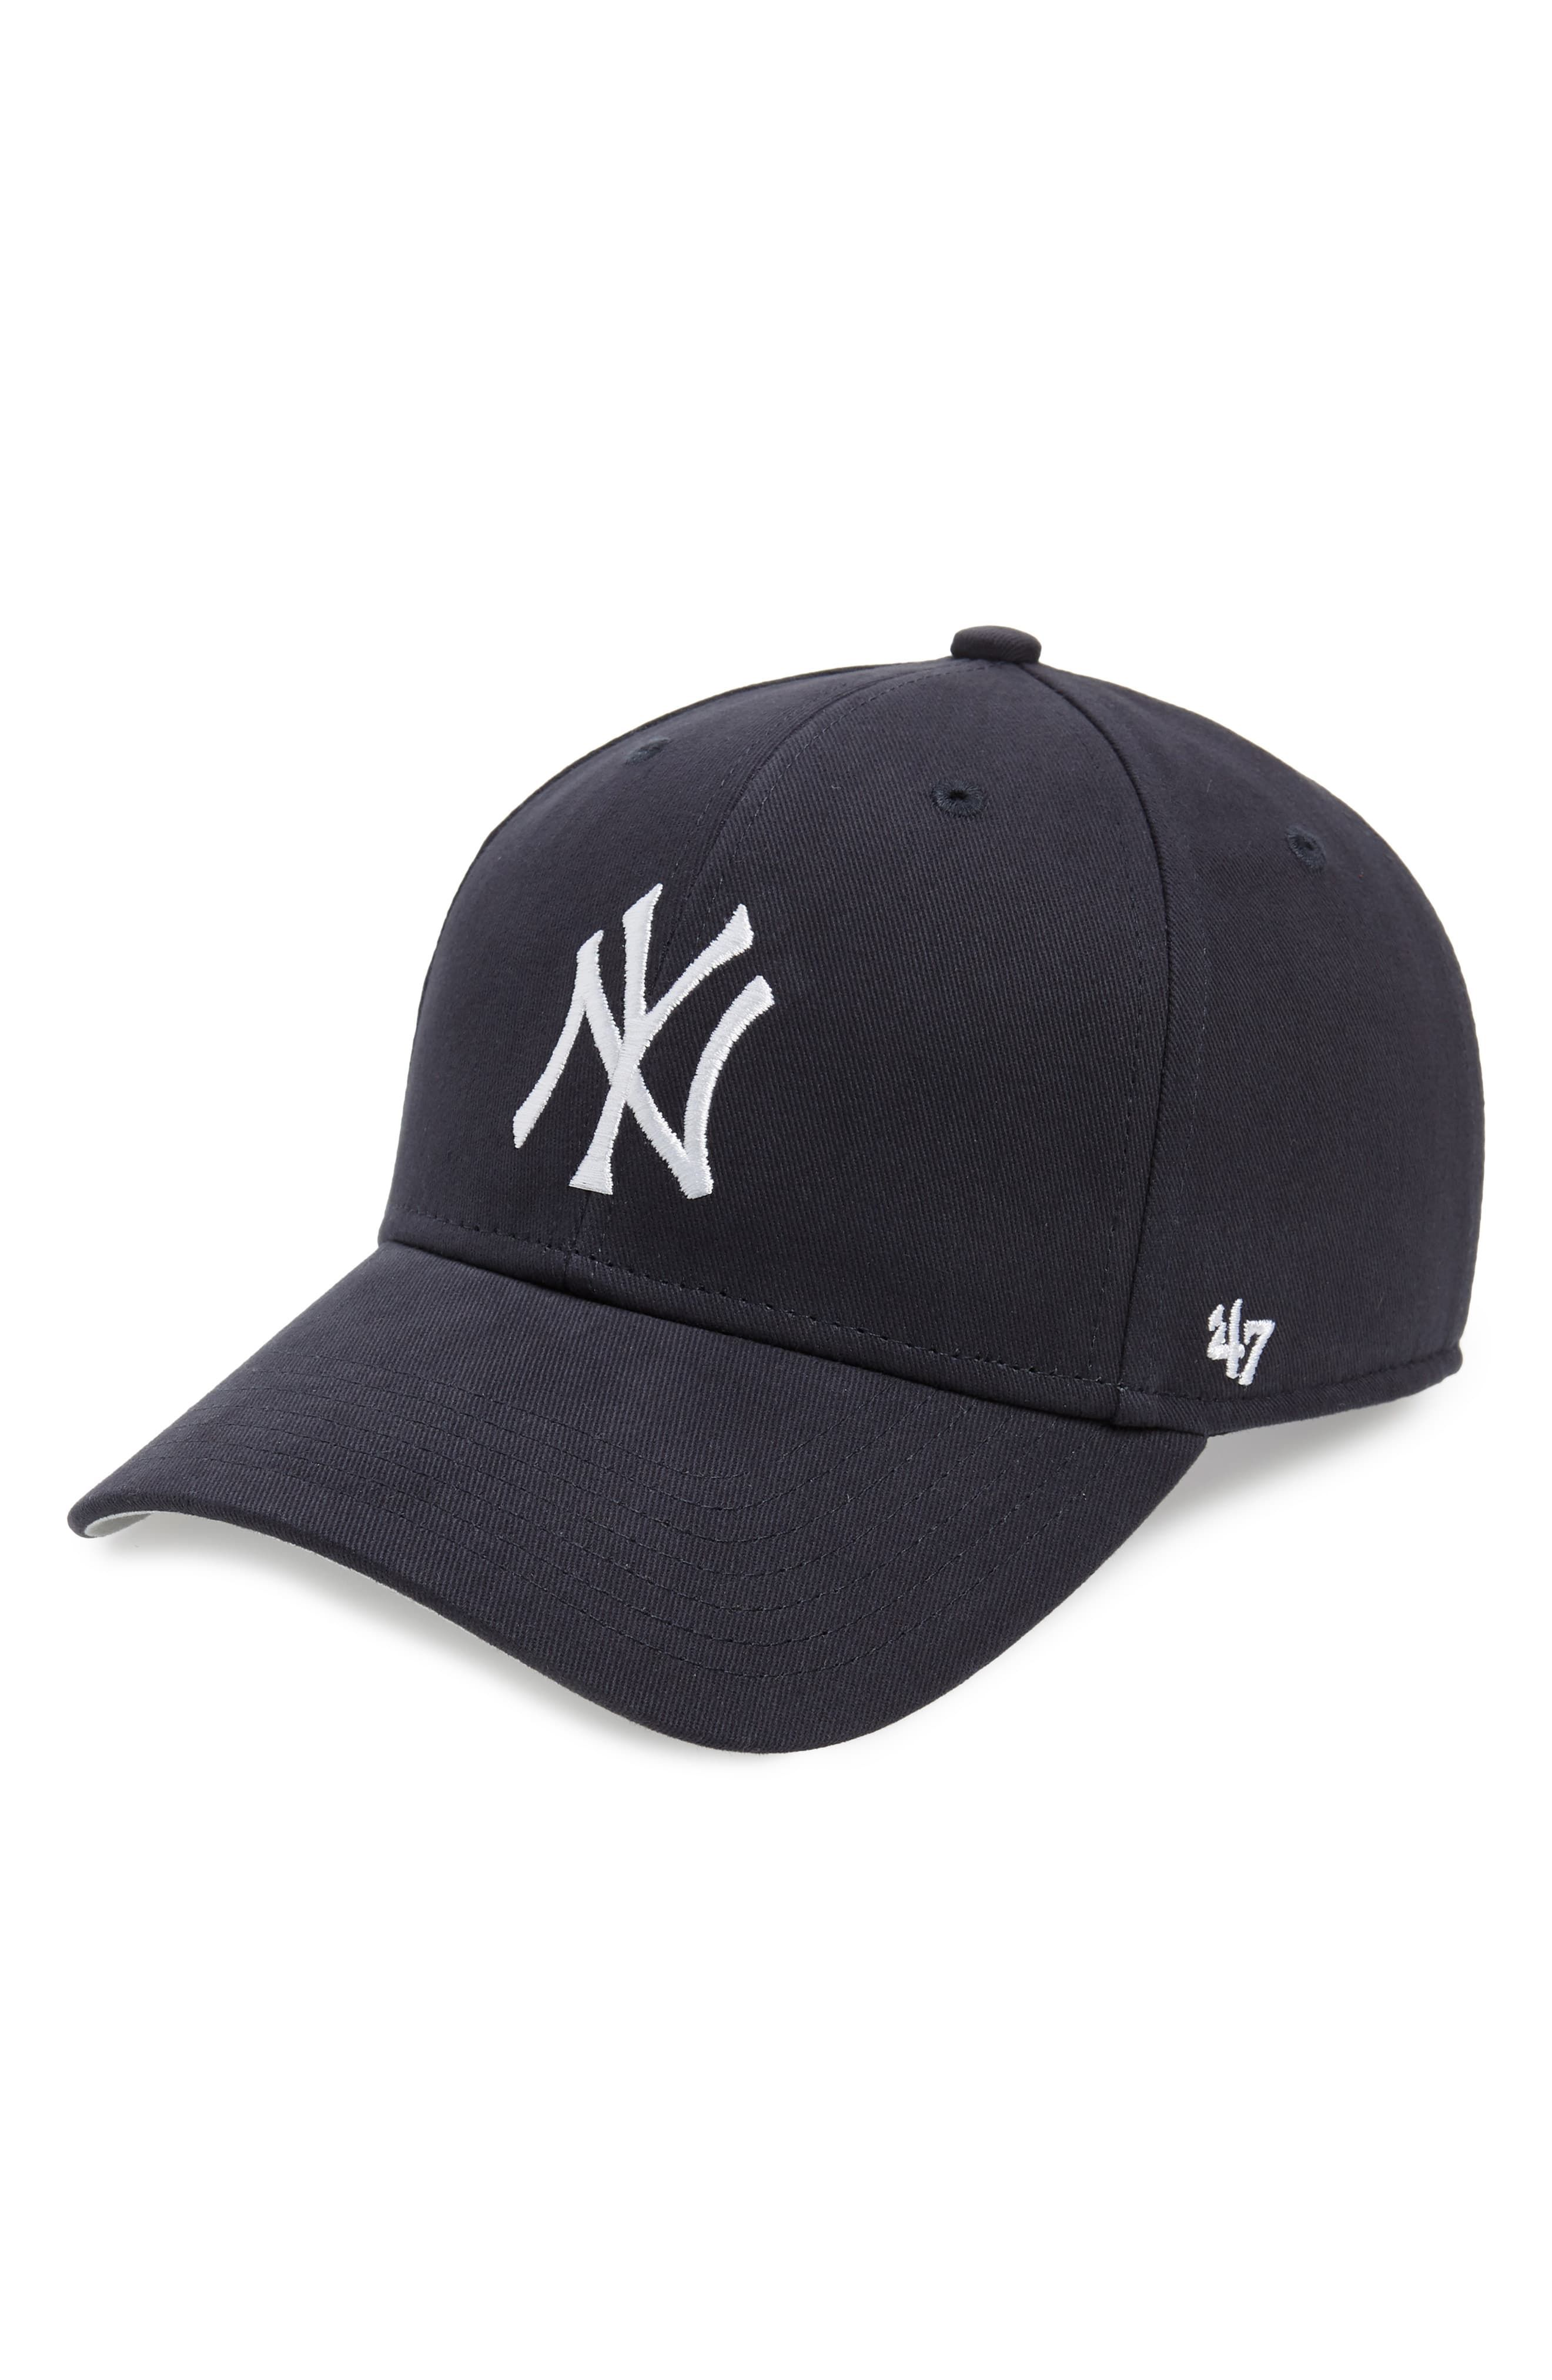 NEWFG Mens Womens Washed Cool Maserati Cap Twill Adjustable Snapback Dad Hat One Size